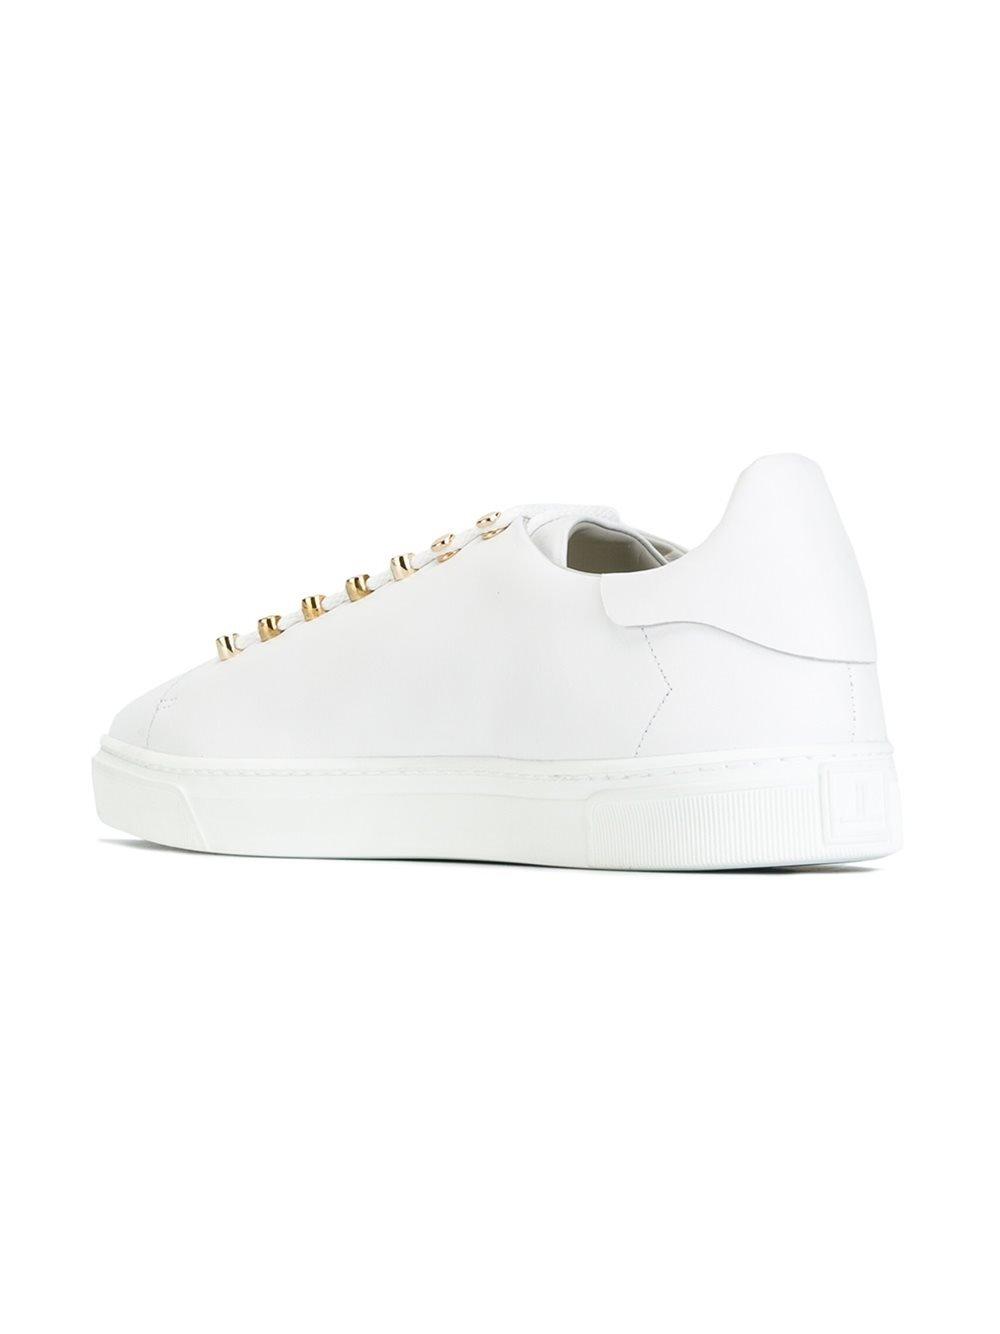 Louis Leeman Leather 'Biaor' Sneakers in White for Men